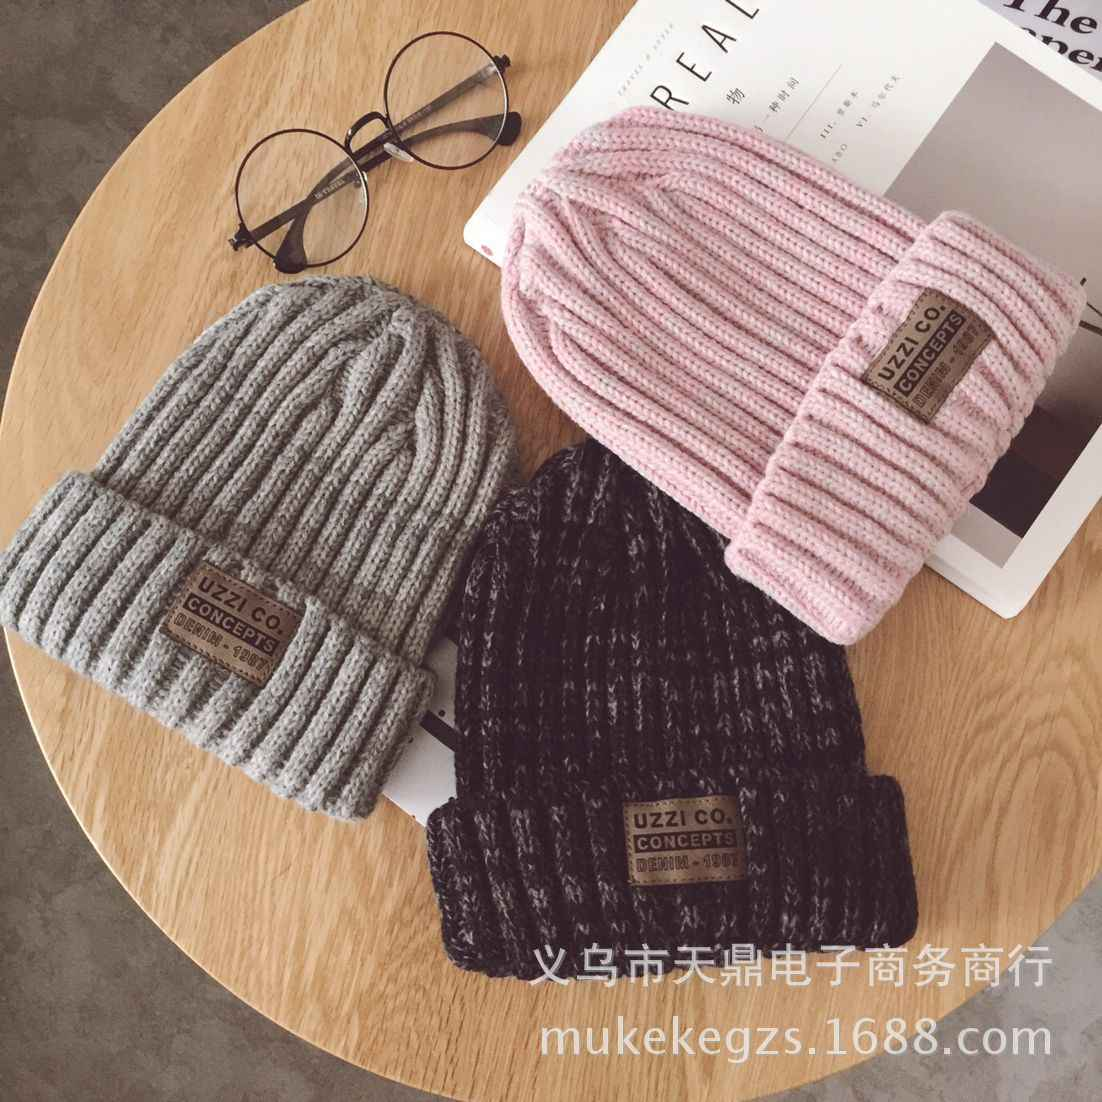 Fashion Twist Tebal Benang Rajutan Topi Anak Perempuan Buatan Musim Dingin Topi Topi Gadis Wanita Benang Merajut Beanies